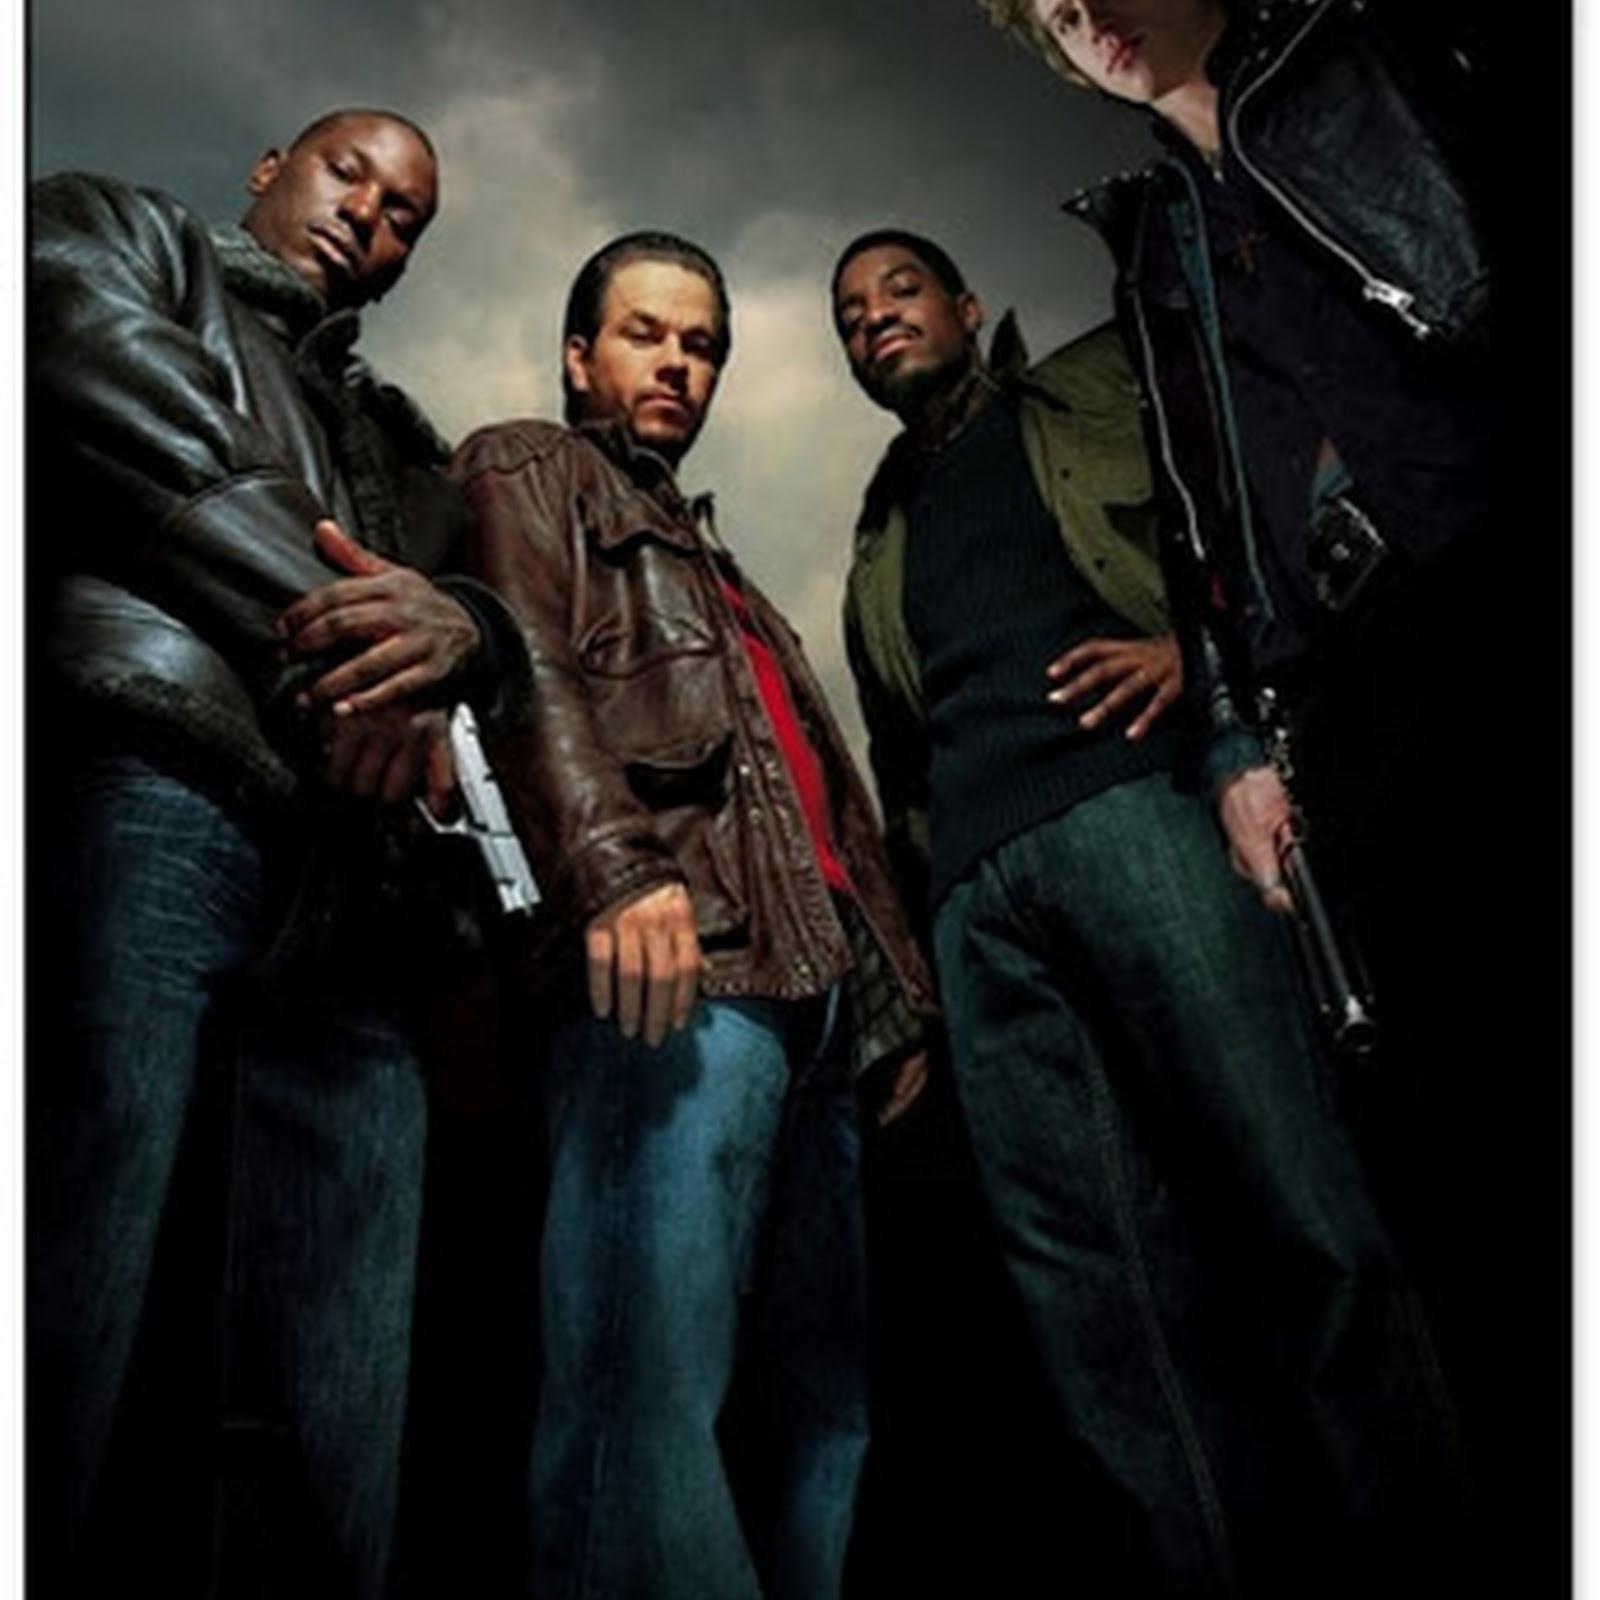 pride and prejudice 2005 full movie download 300mb